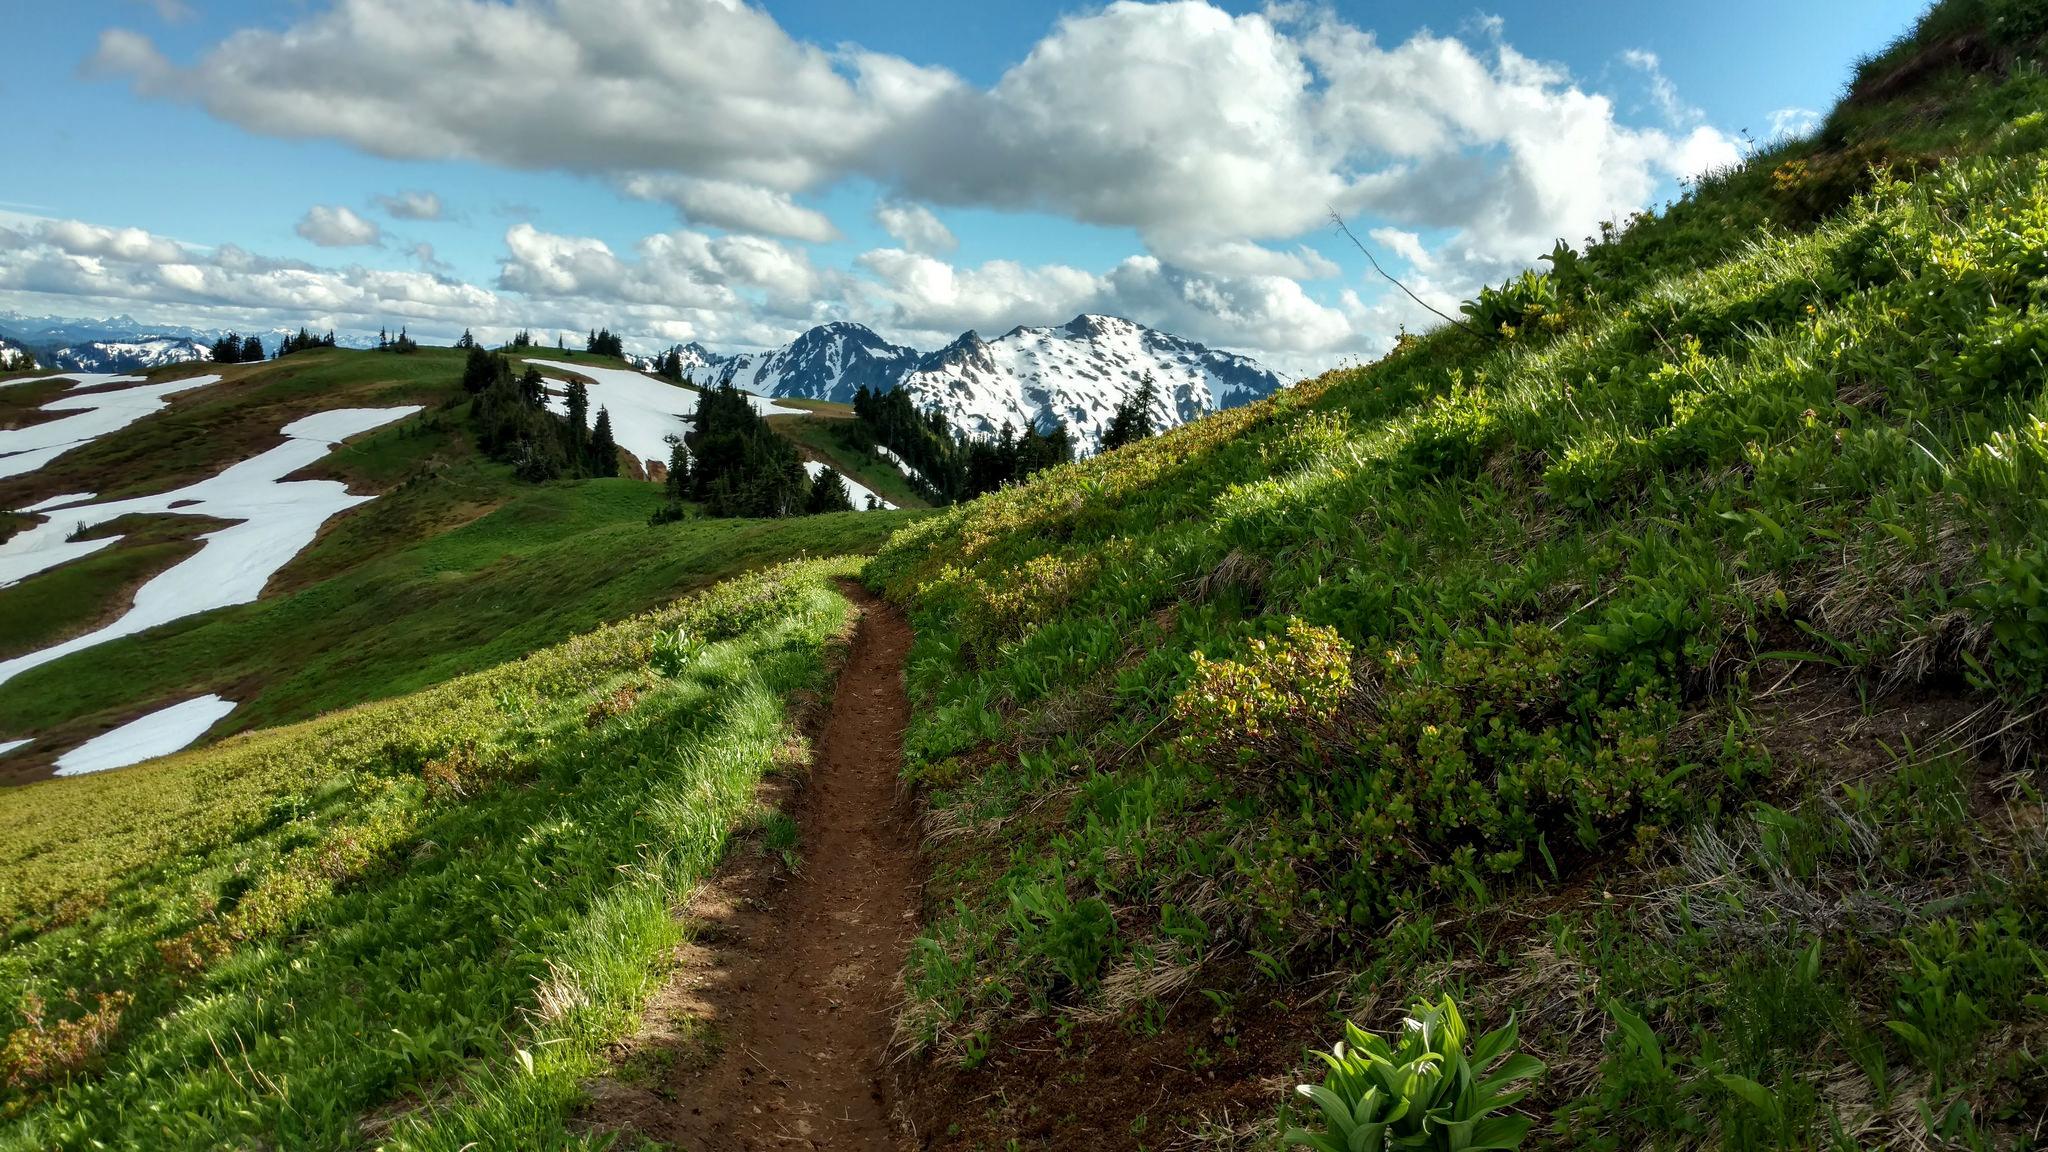 Foam Creek Trail by Grant Roush